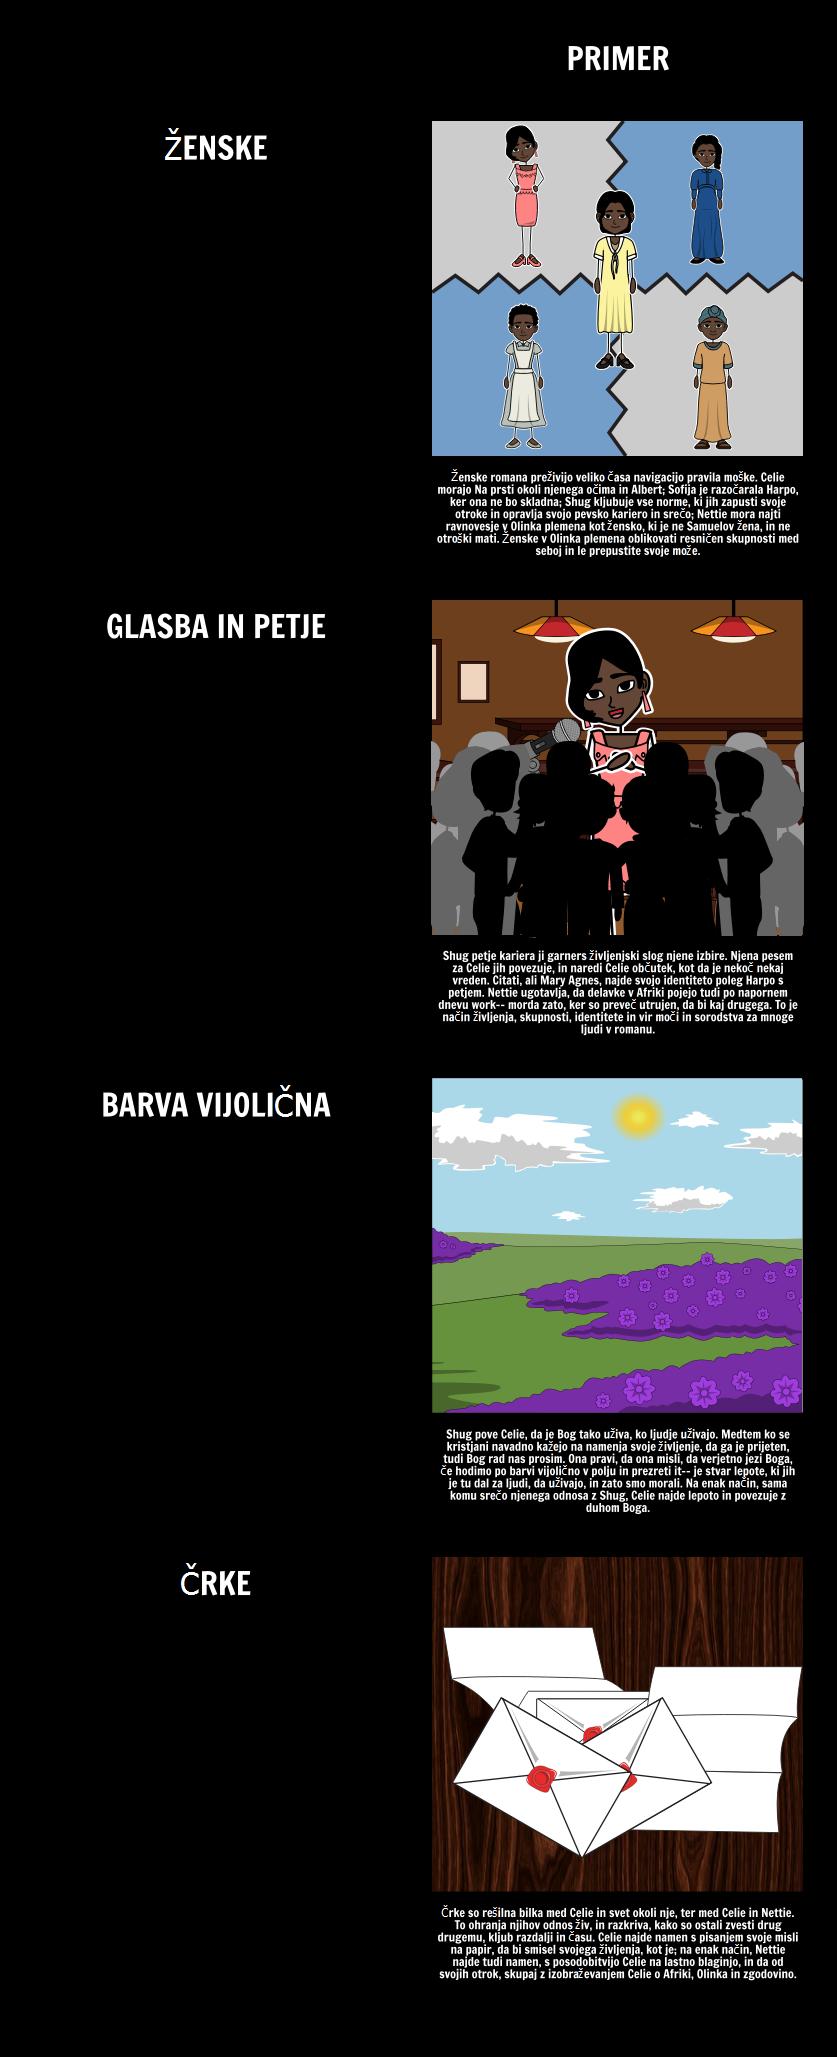 Teme, Simboli in Motivi v The Color Purple